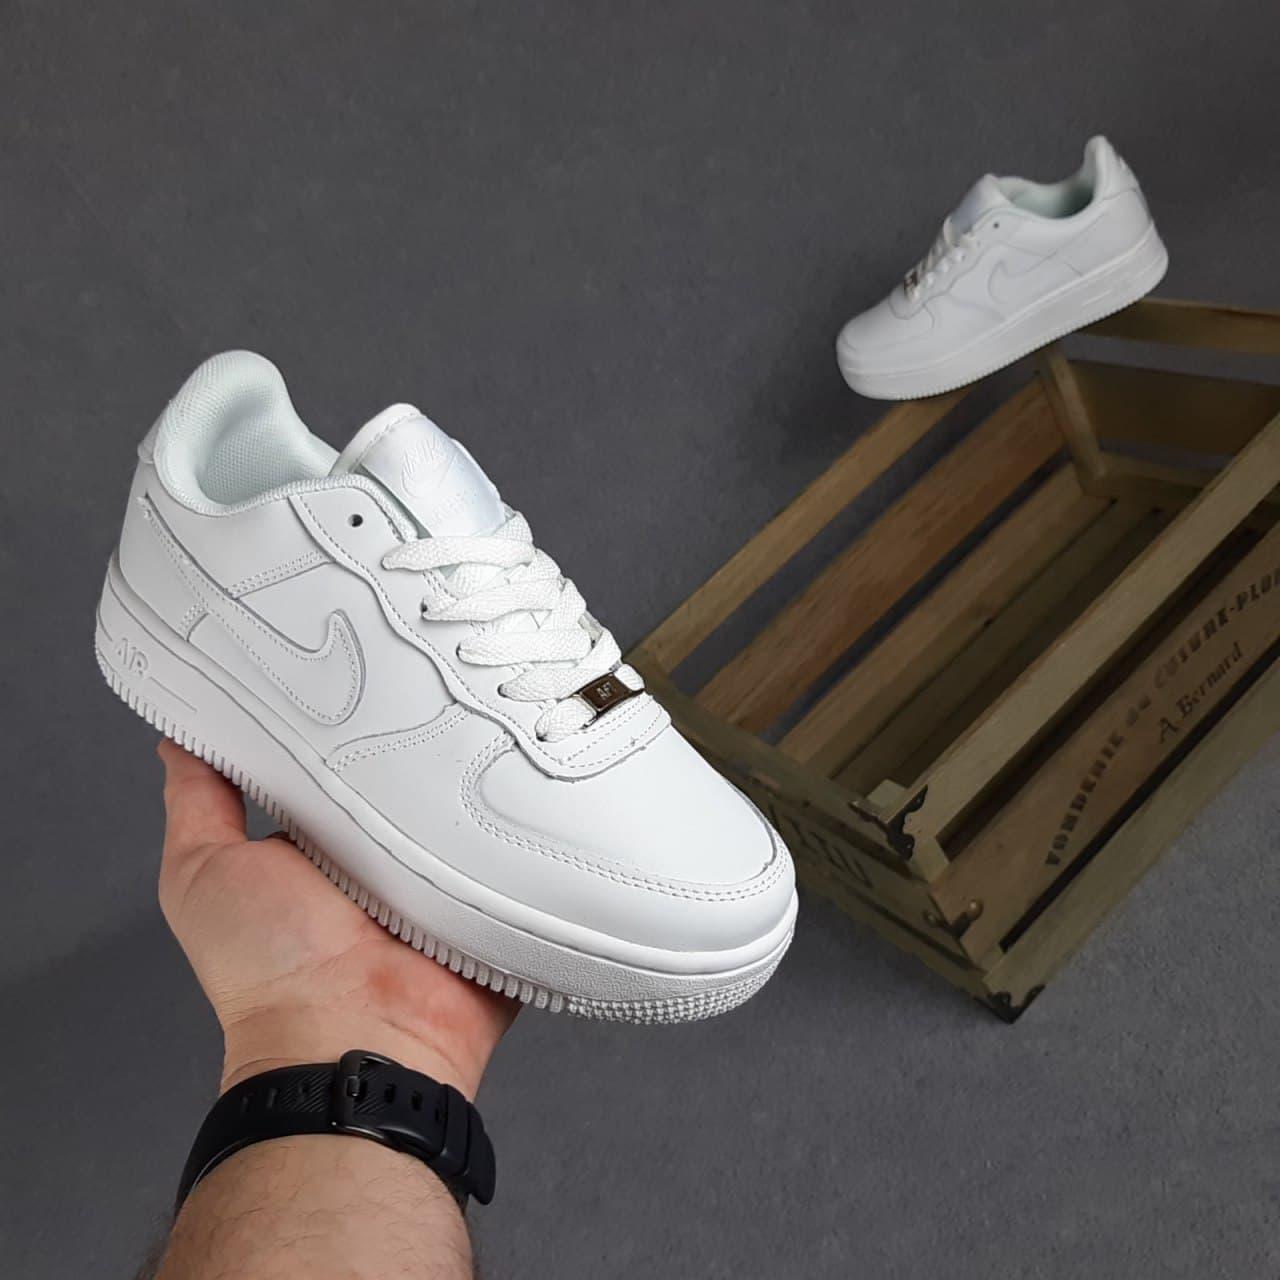 Кросівки Air Force білі низькі 36-41